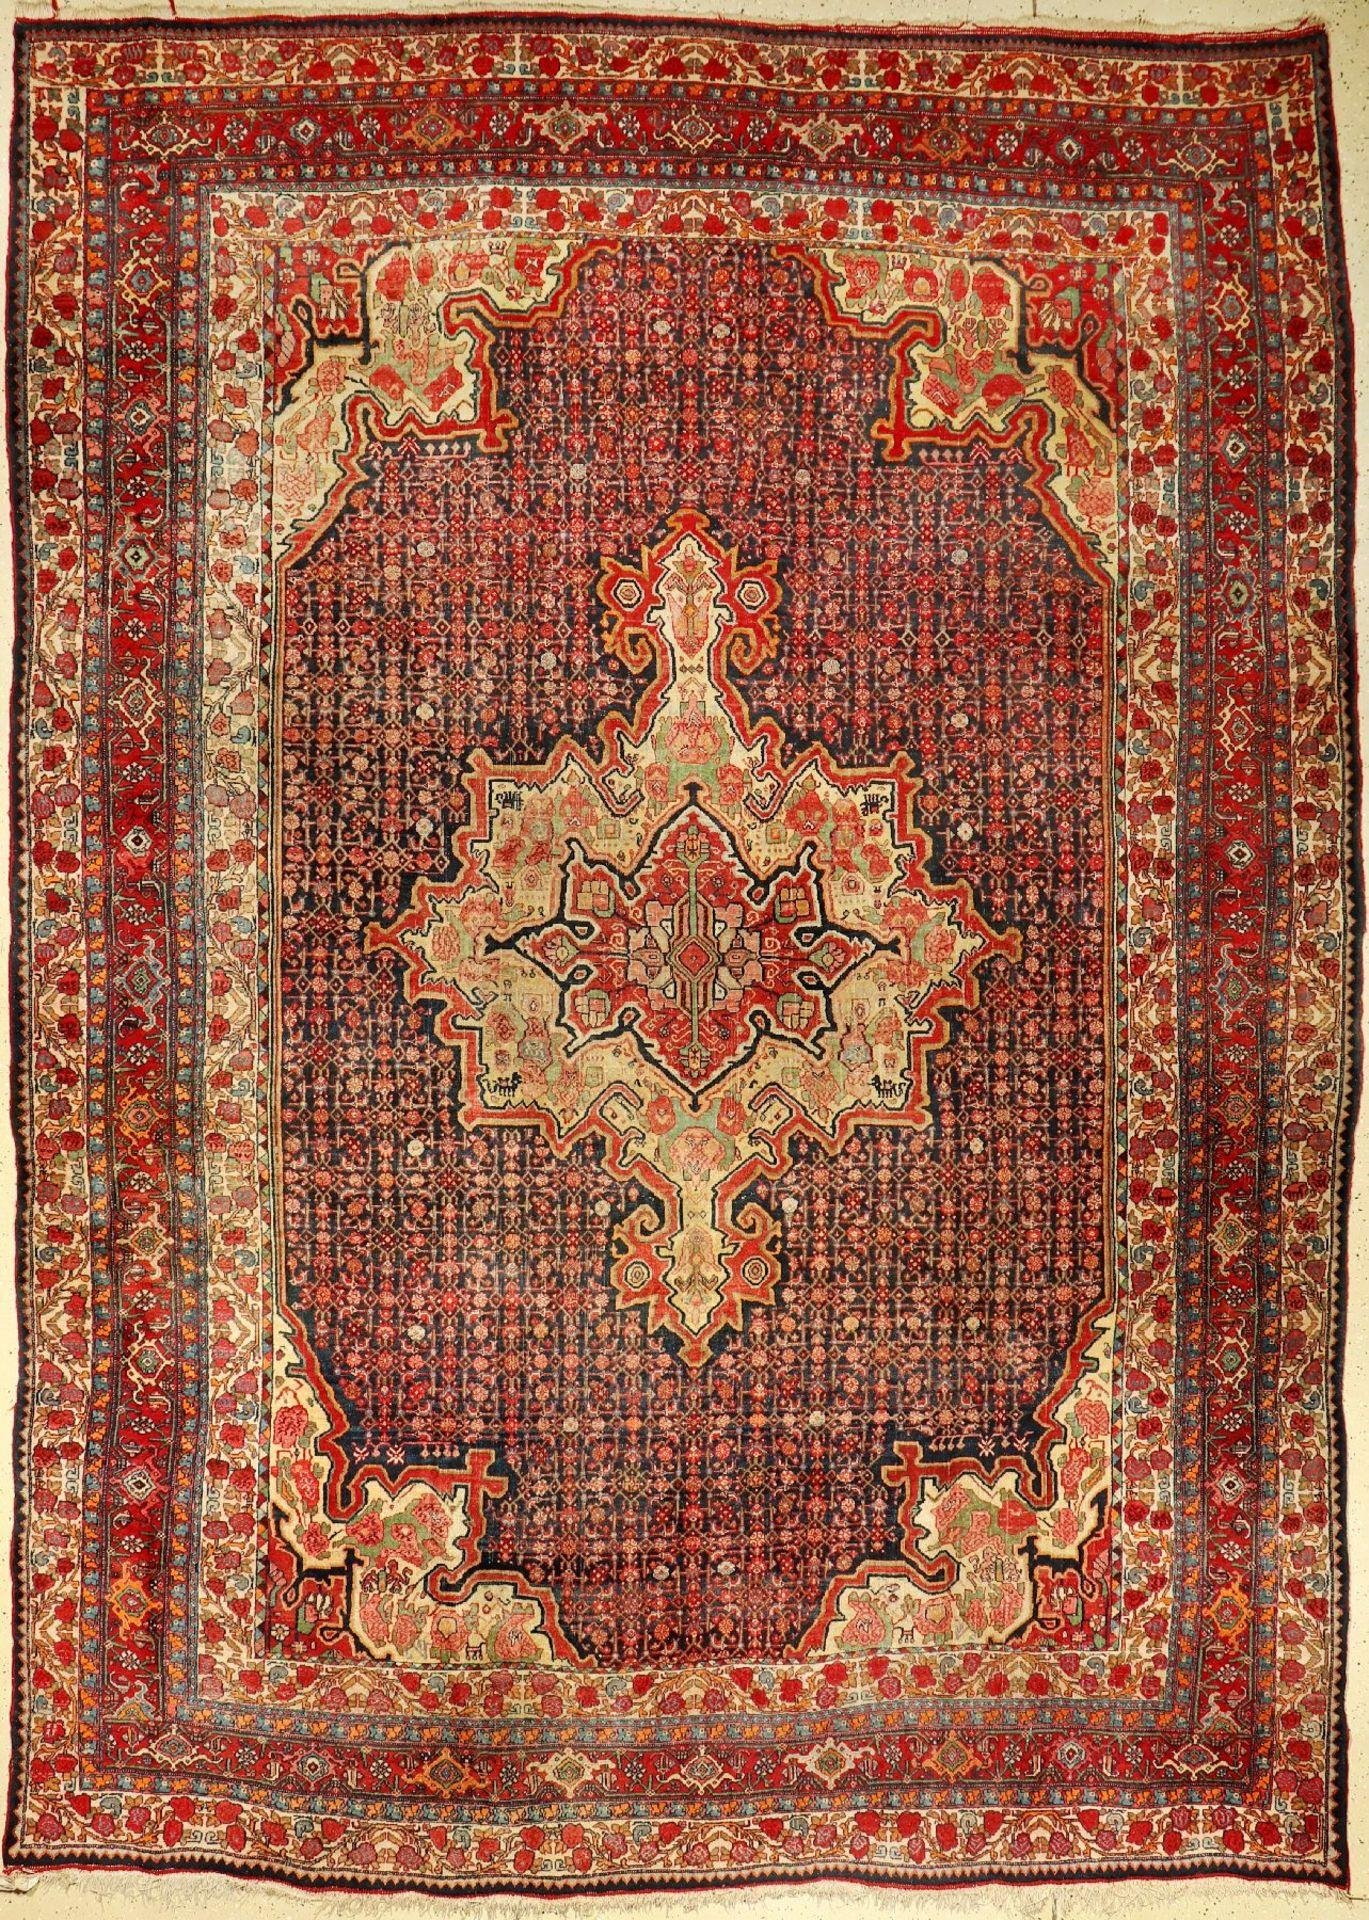 Bidjar antik, Persien, um 1920, Wolle auf Baumwolle, ca. 366 x 260 cm, EHZ: 3Bidjar antique, Persia,